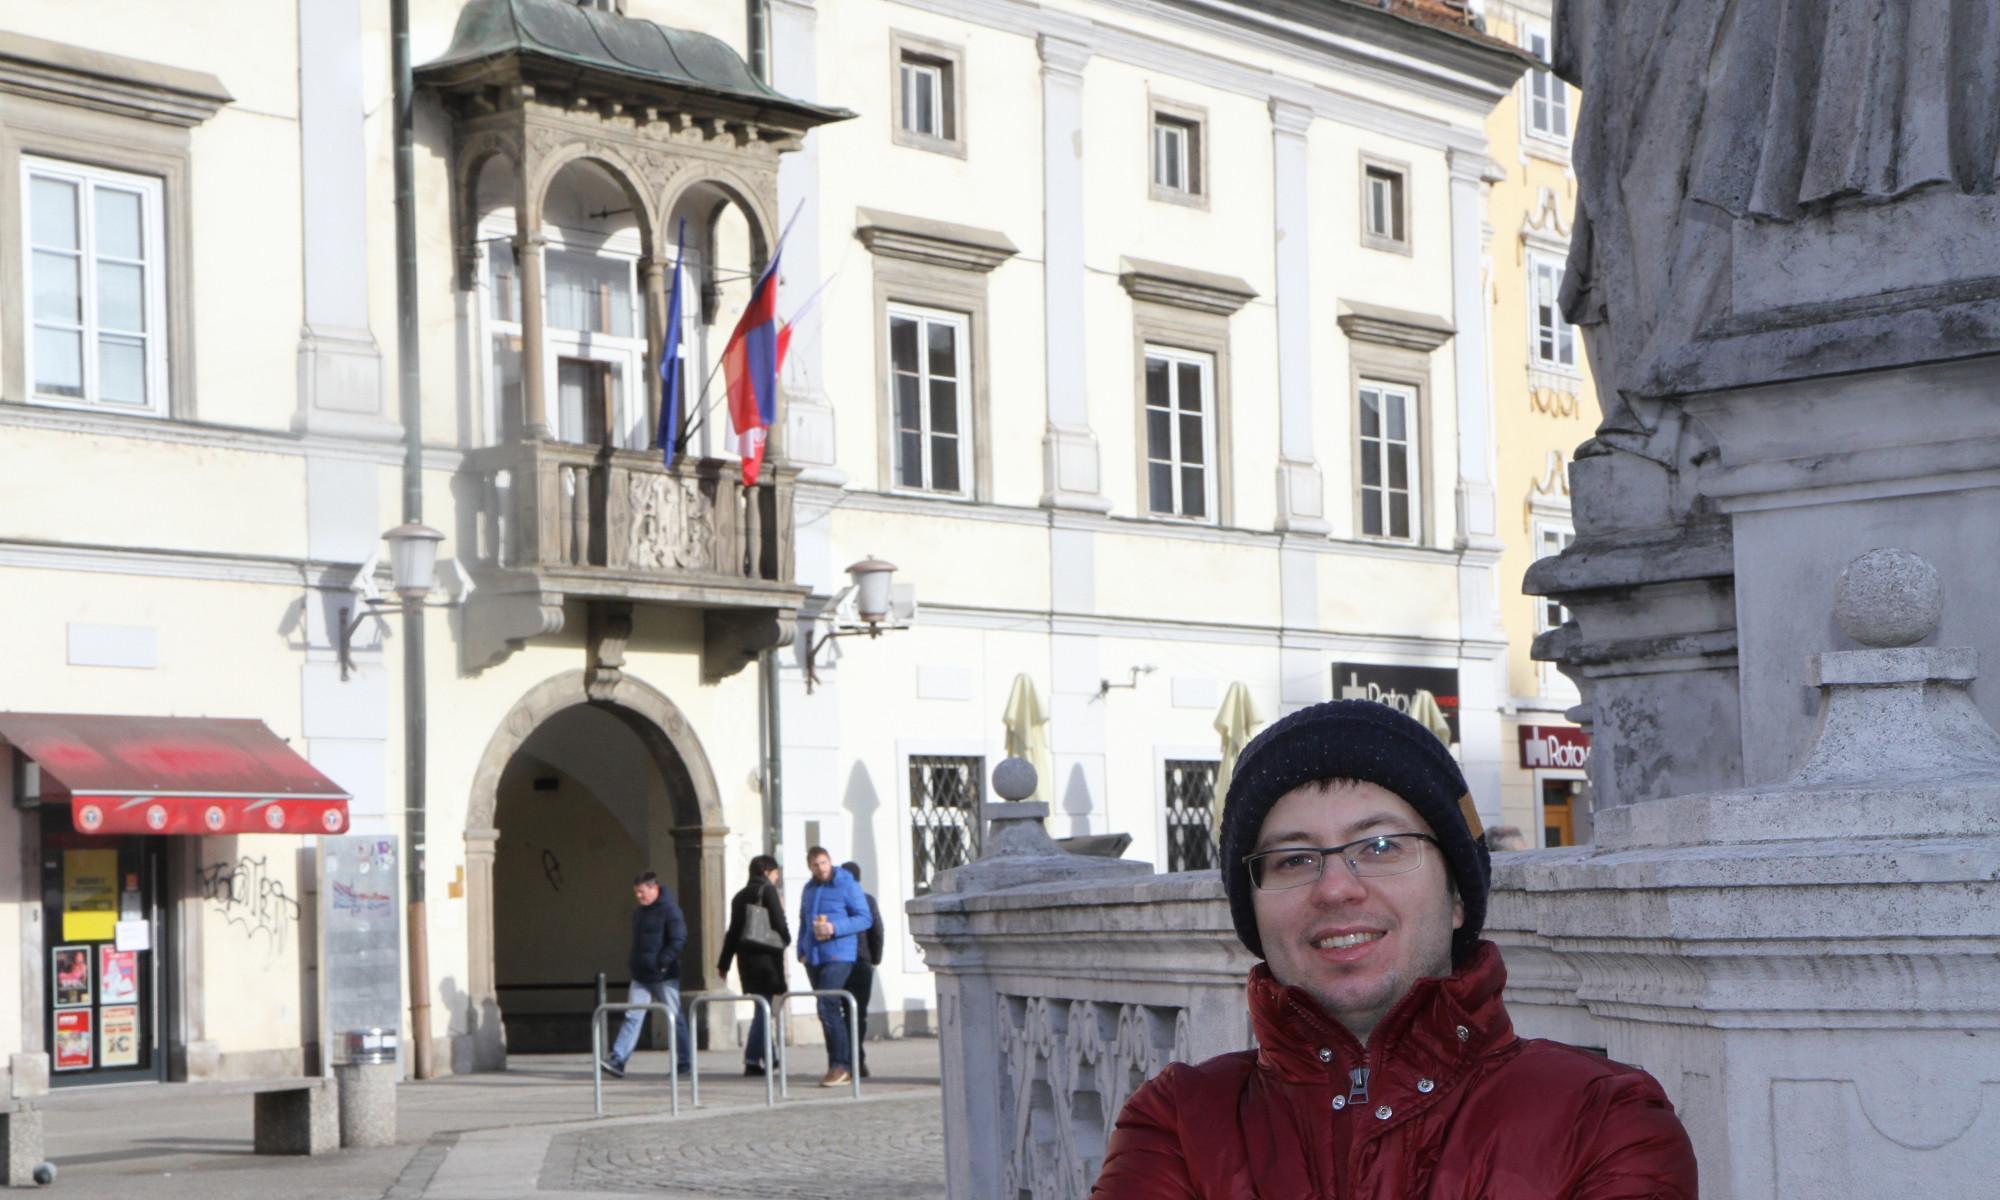 Nov medij v Mariboru – udeleženec Primož Soban